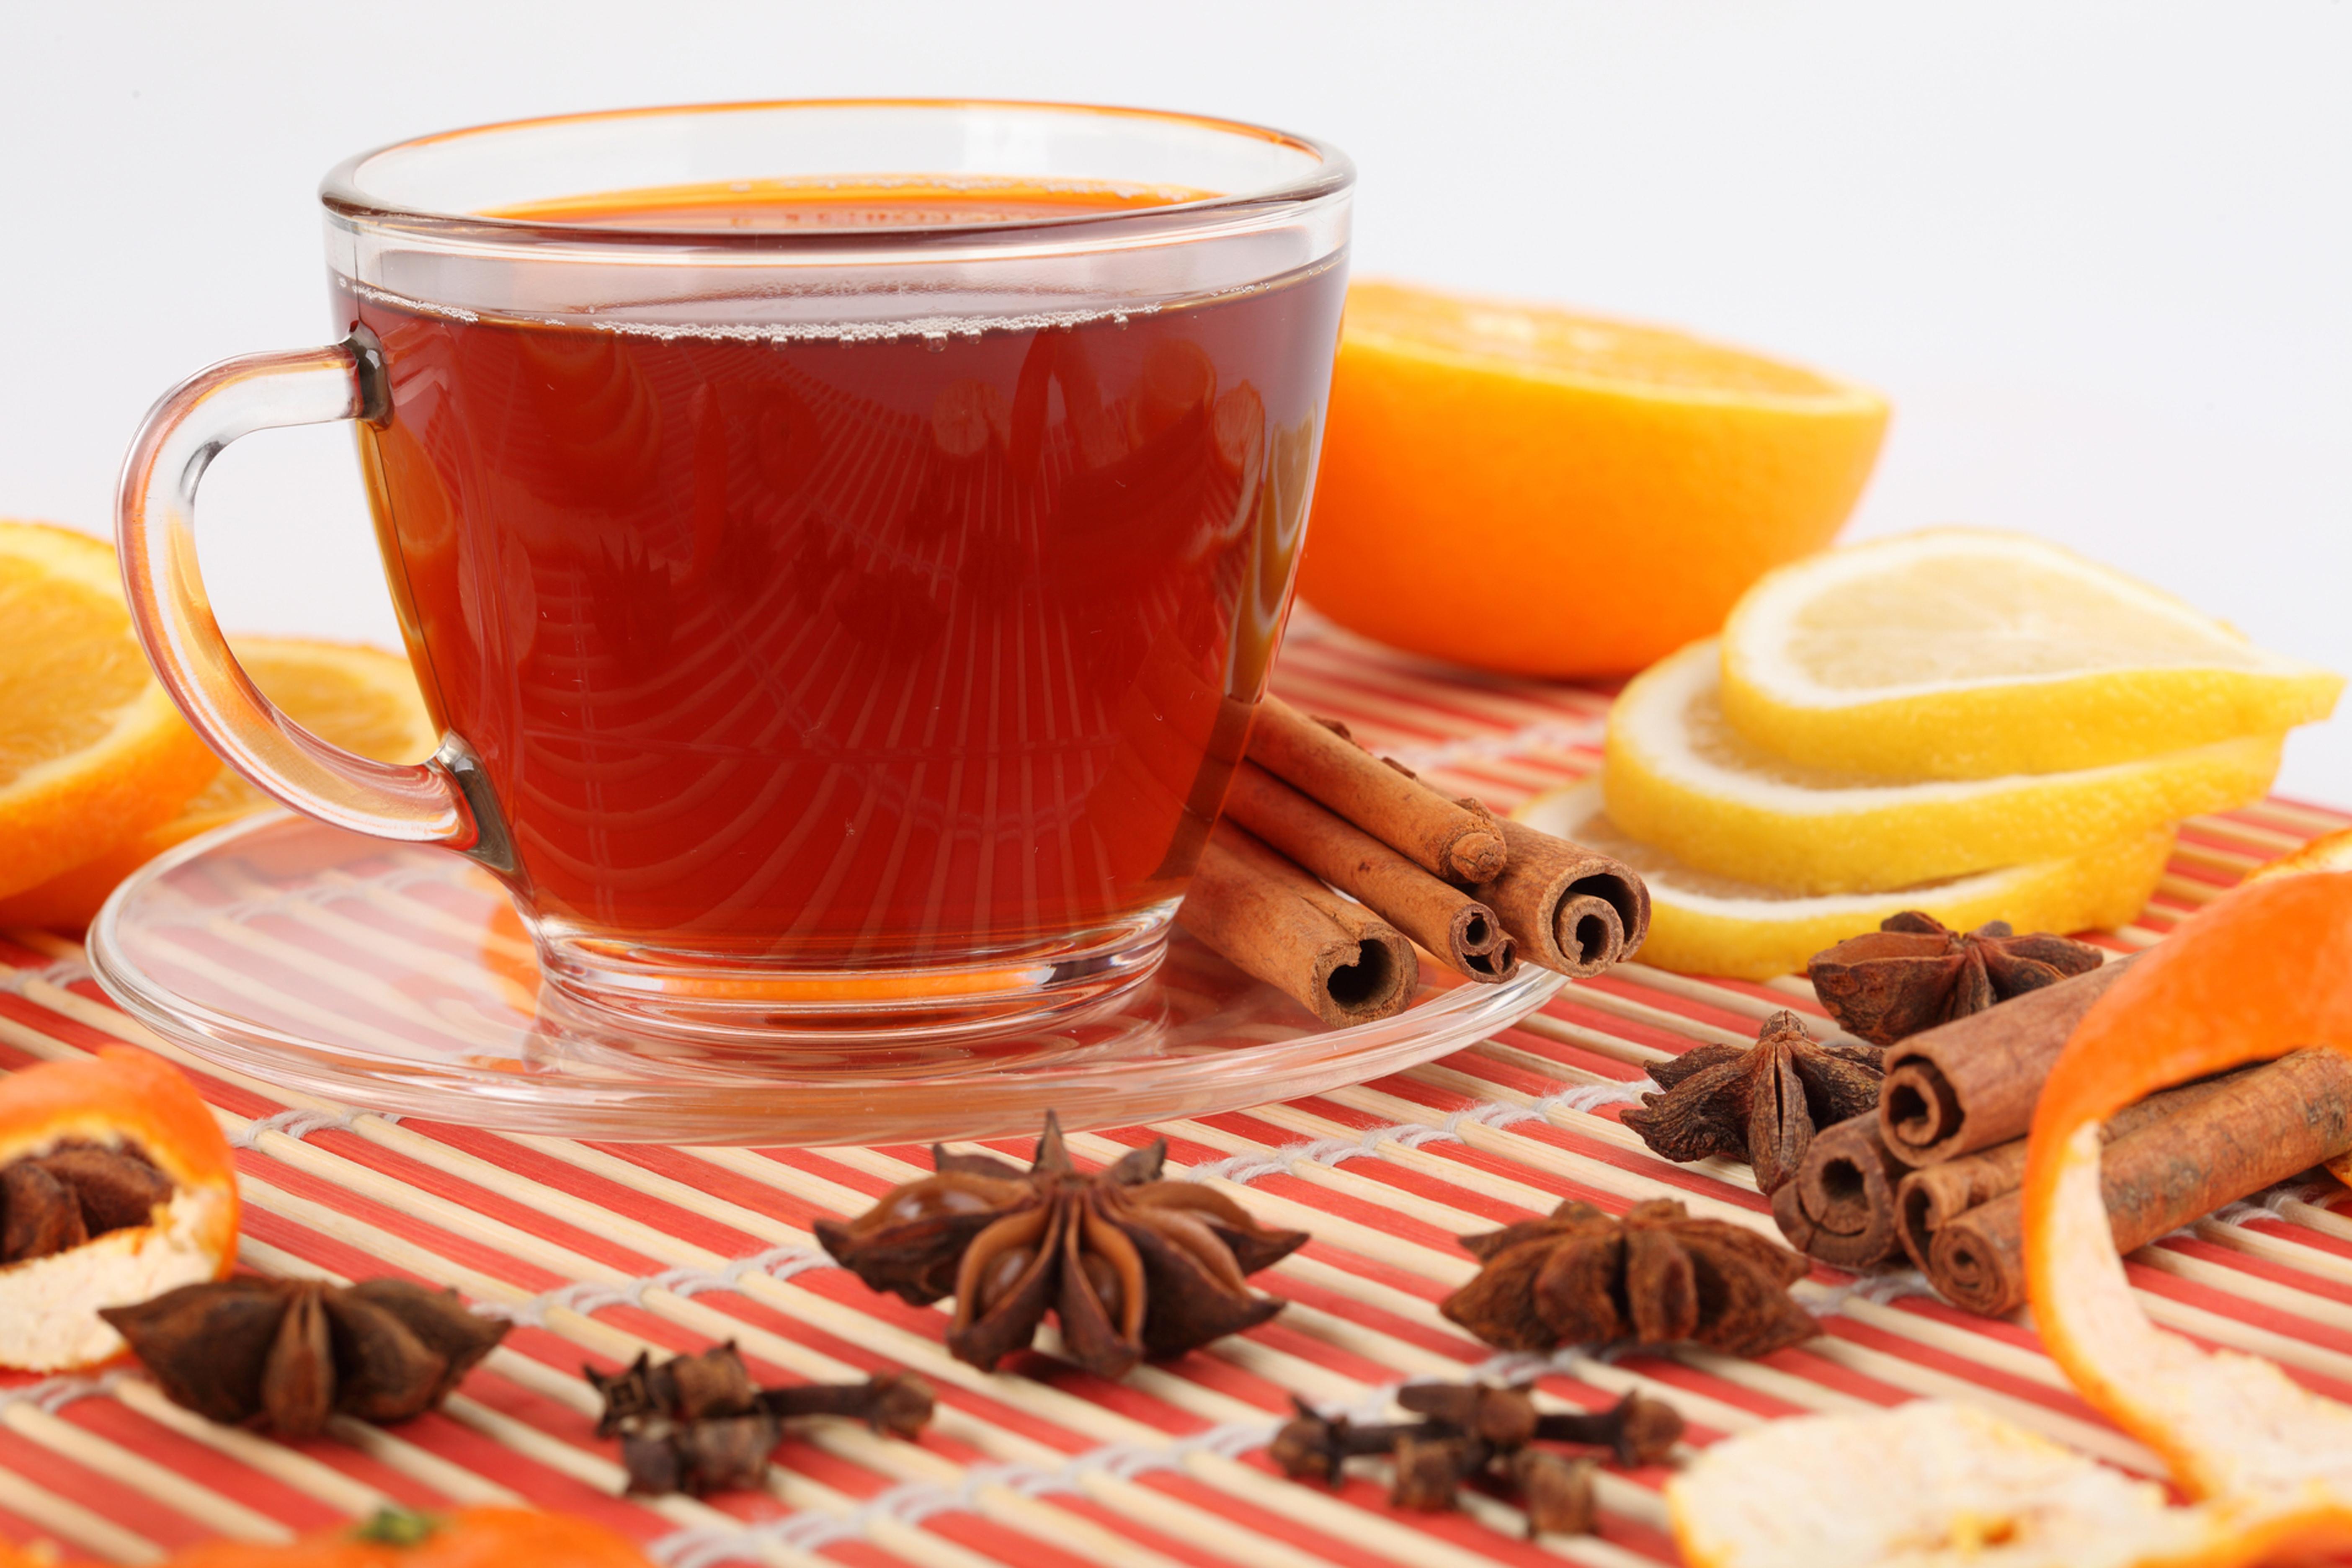 http://www.zastavki.com/pictures/originals/2015/Food___Drinks_Tea_with_lemon_and_cinnamon_093164_.jpg